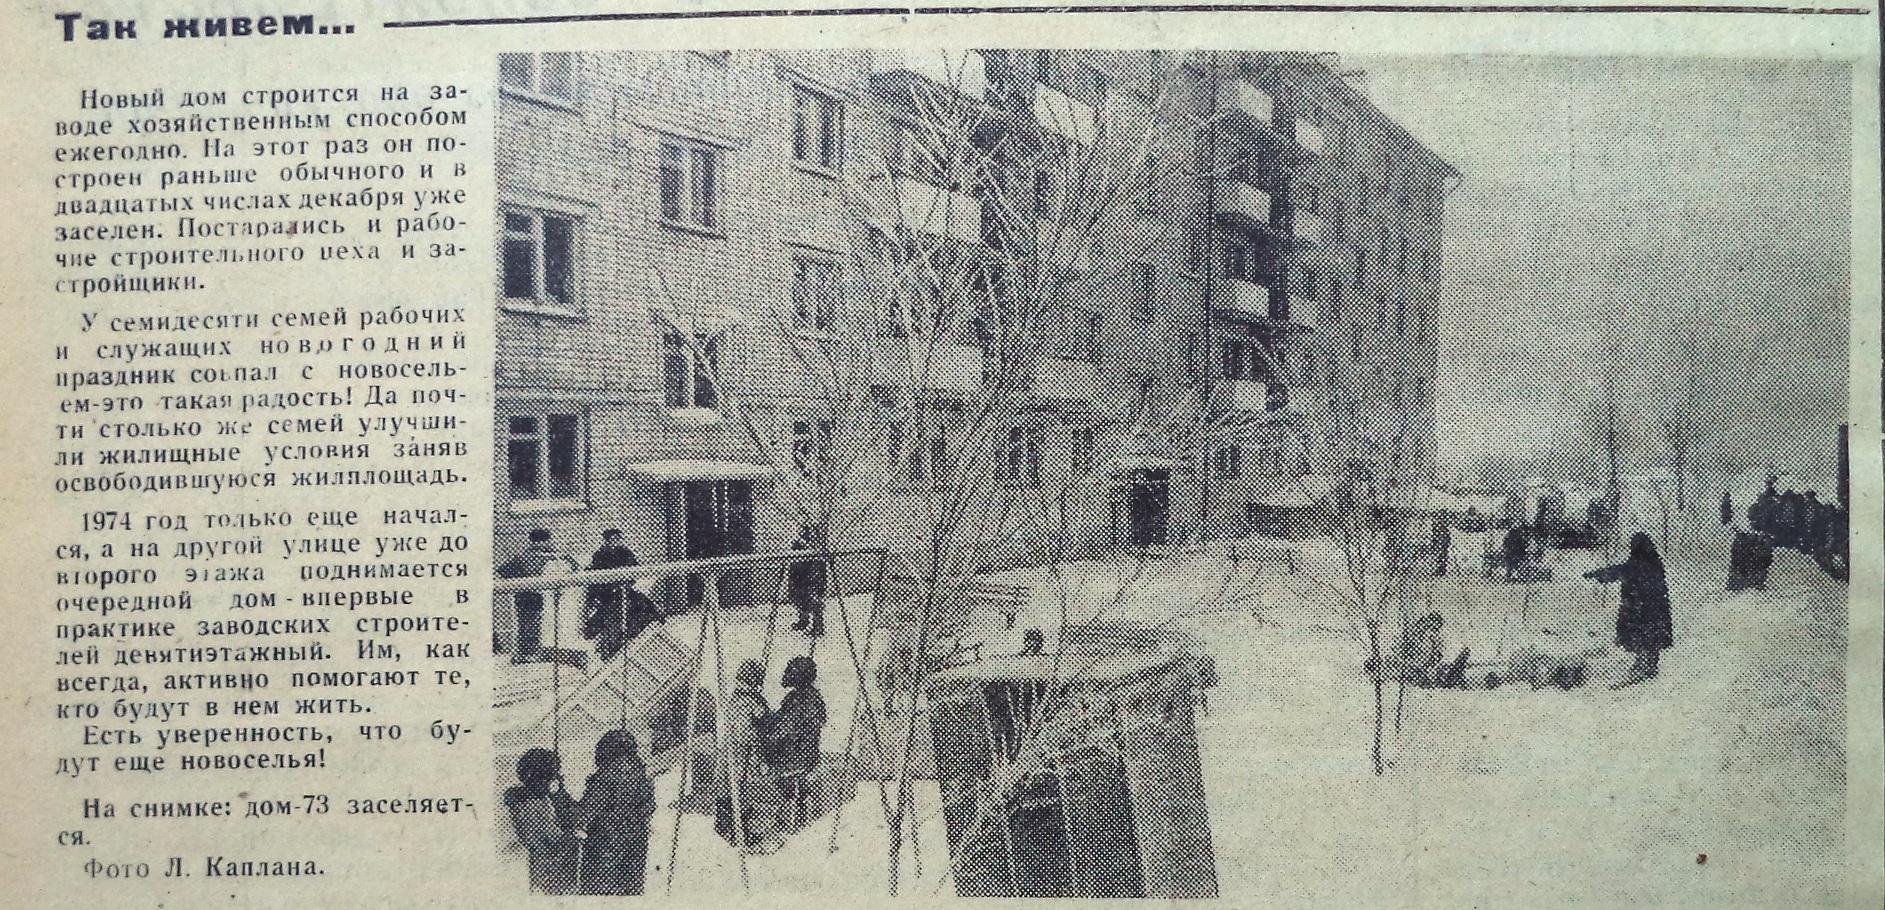 Запорожская-ФОТО-31-За коммунистический труд-1974-11 января